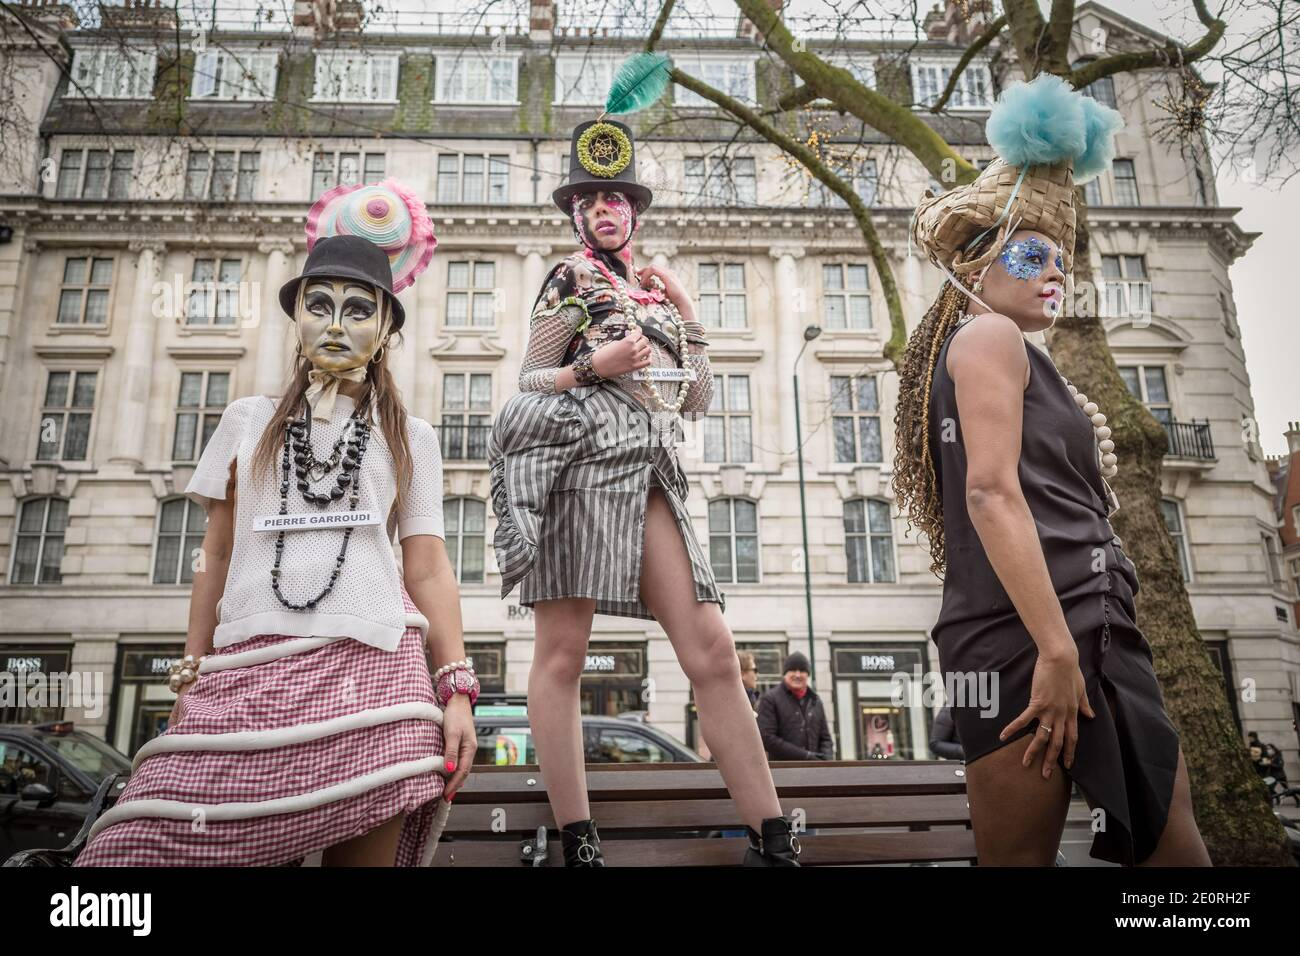 London, UK. 2nd January 2021. Models take part in a colourful flashmob street fashion show near Sloane Square for designer Pierre Garroudi. Credit: Guy Corbishley / Alamy Live News Stock Photo